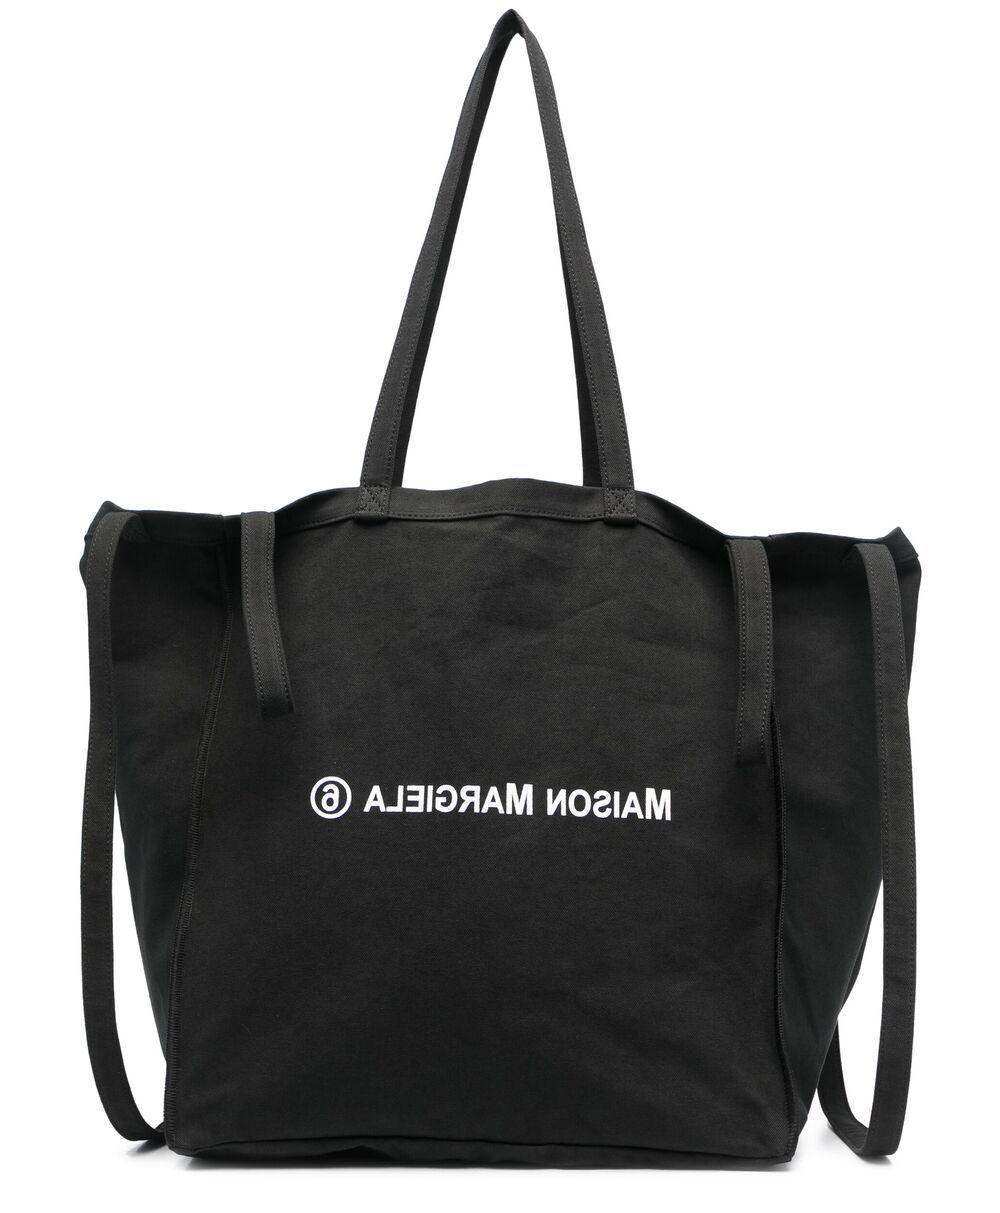 Maison Margiela MM6 Logo Tote Bag